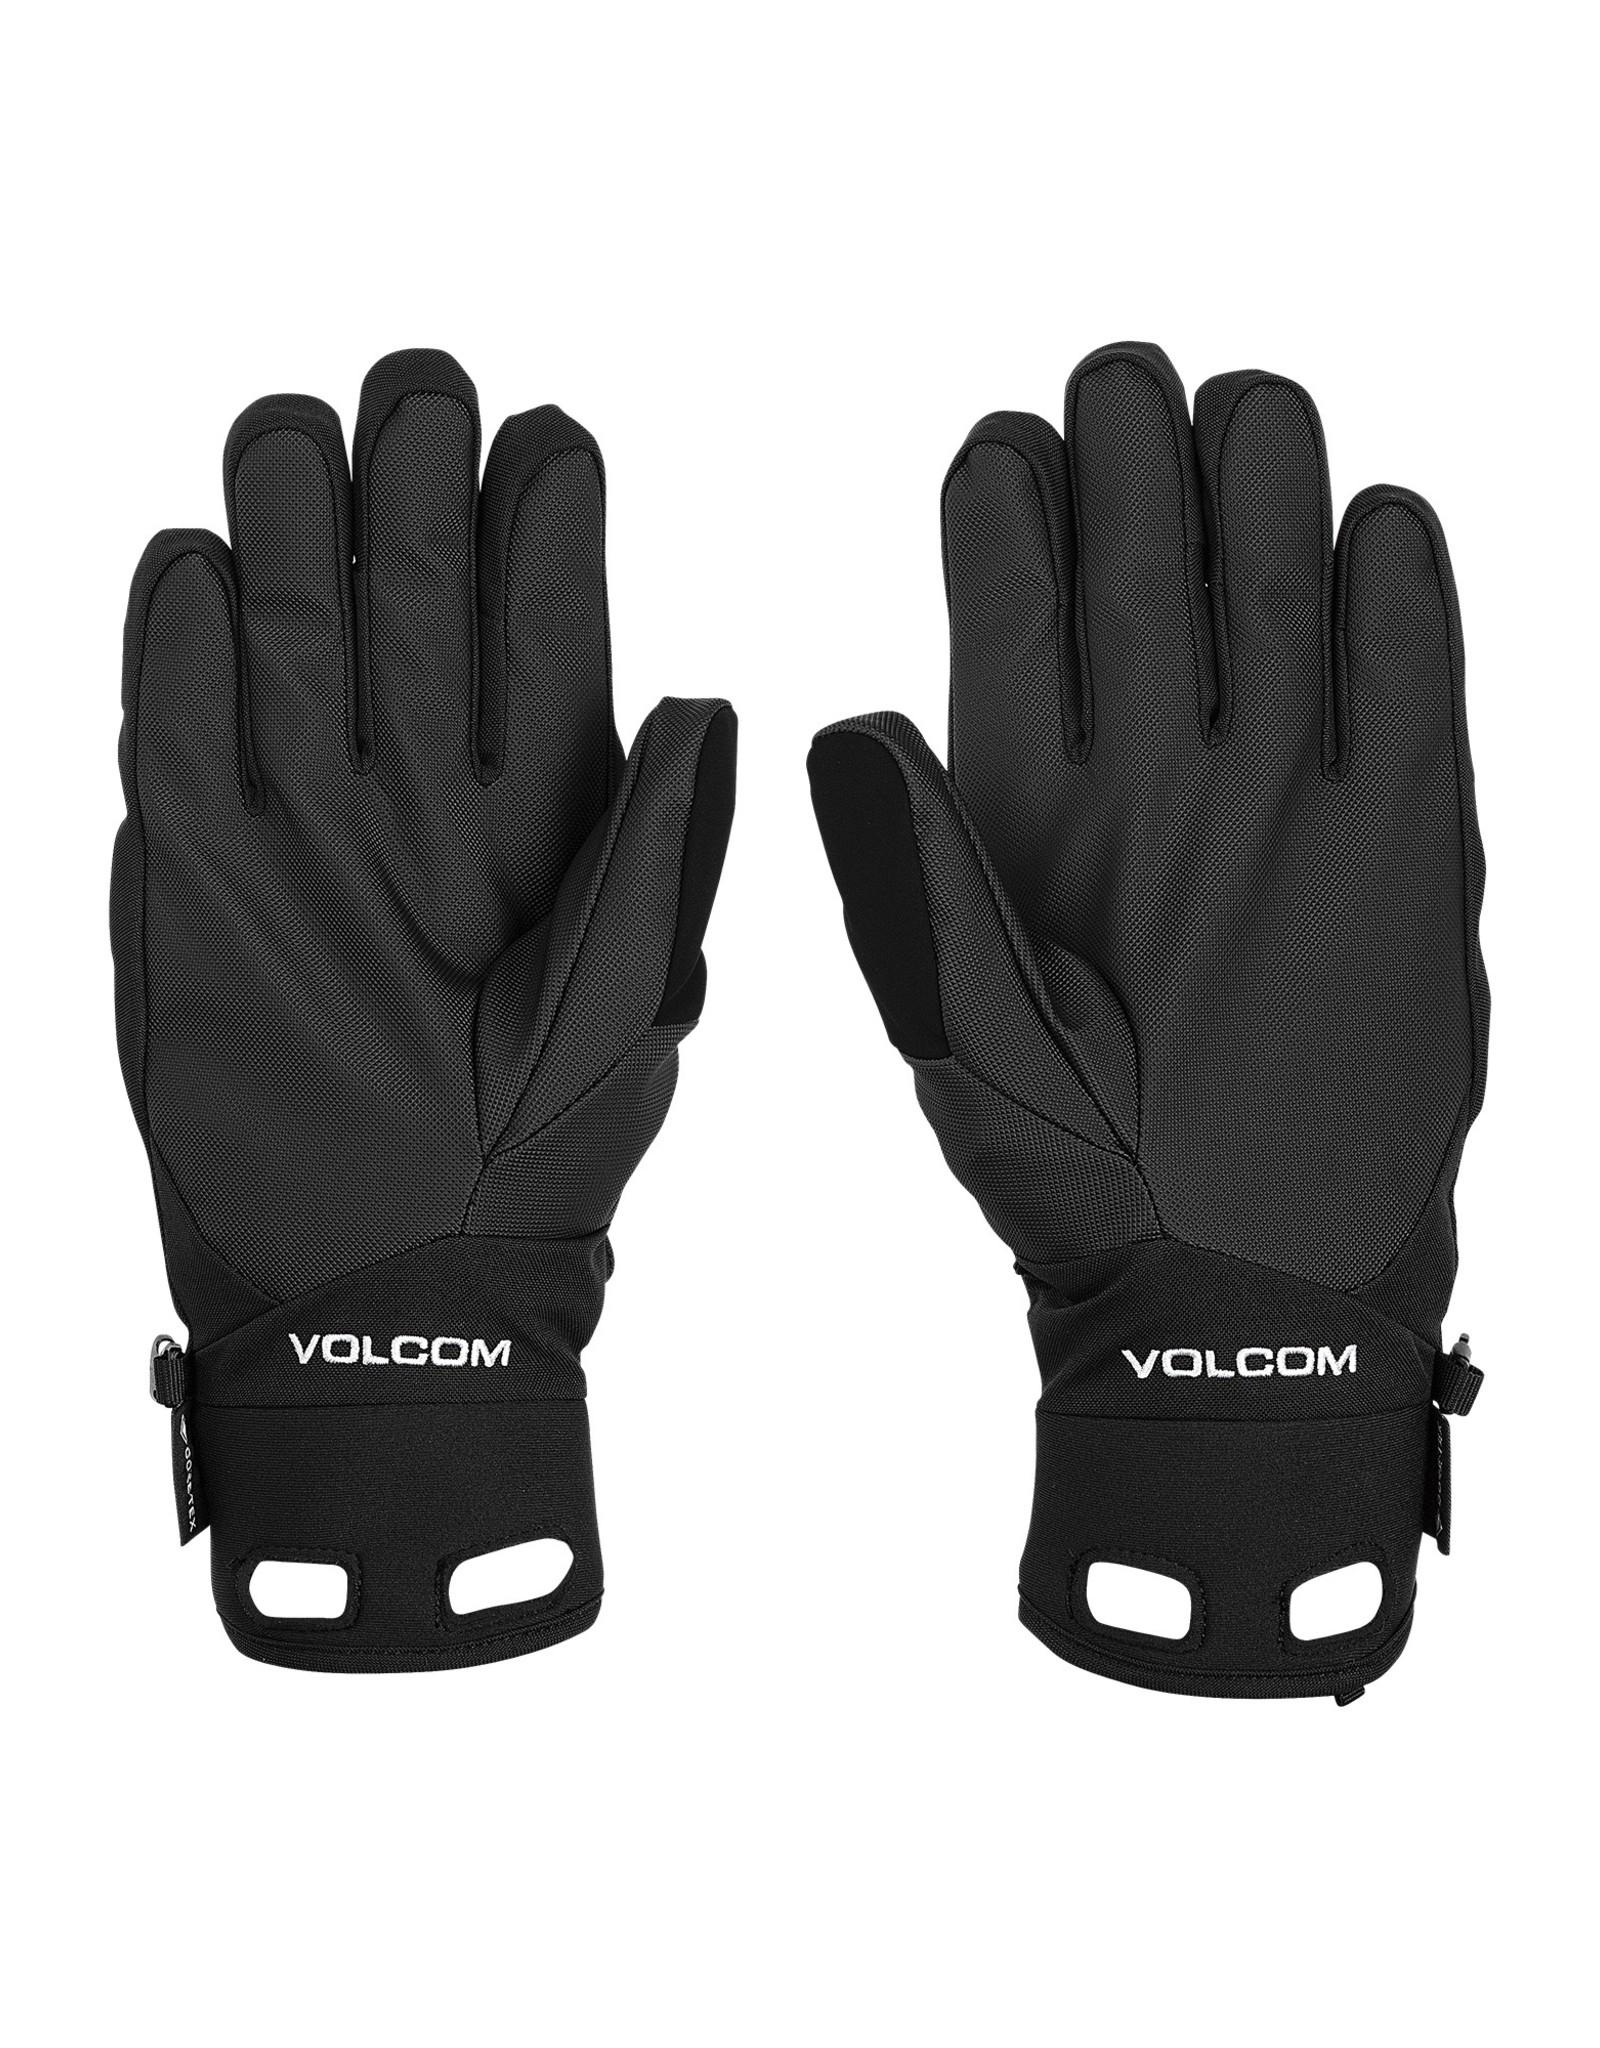 Volcom VOLCOM CP2 GORE-TEX GLOVE